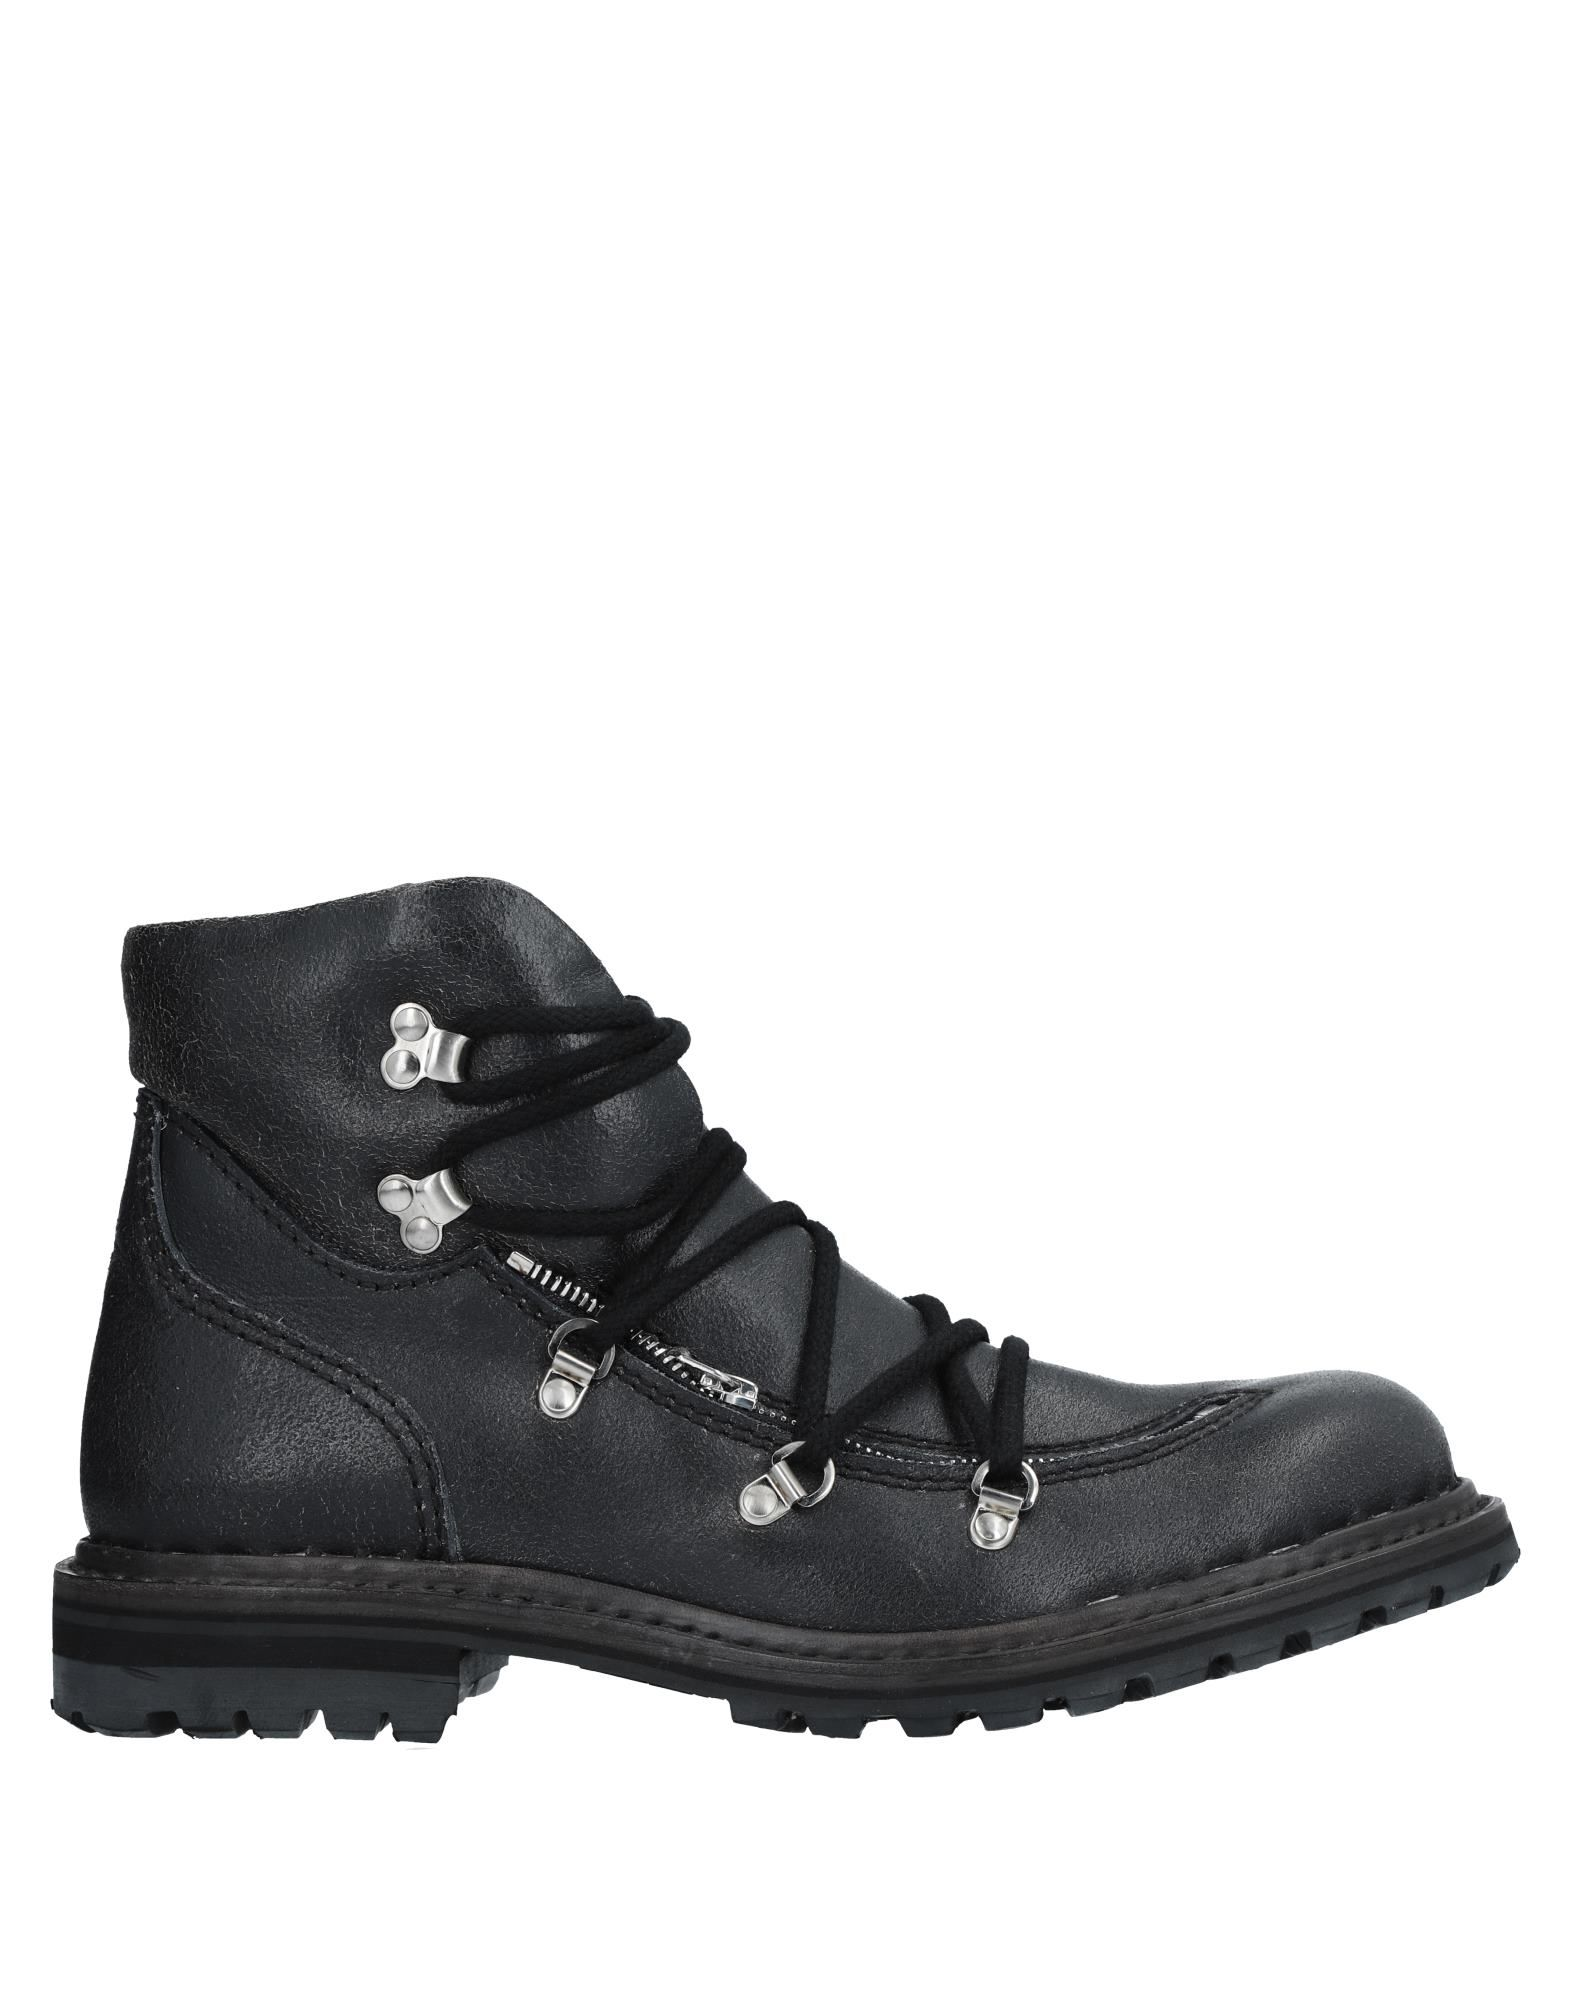 premiata bottes ligne - hommes premiata bottes en ligne bottes sur l'australie - 11531109at c6e274